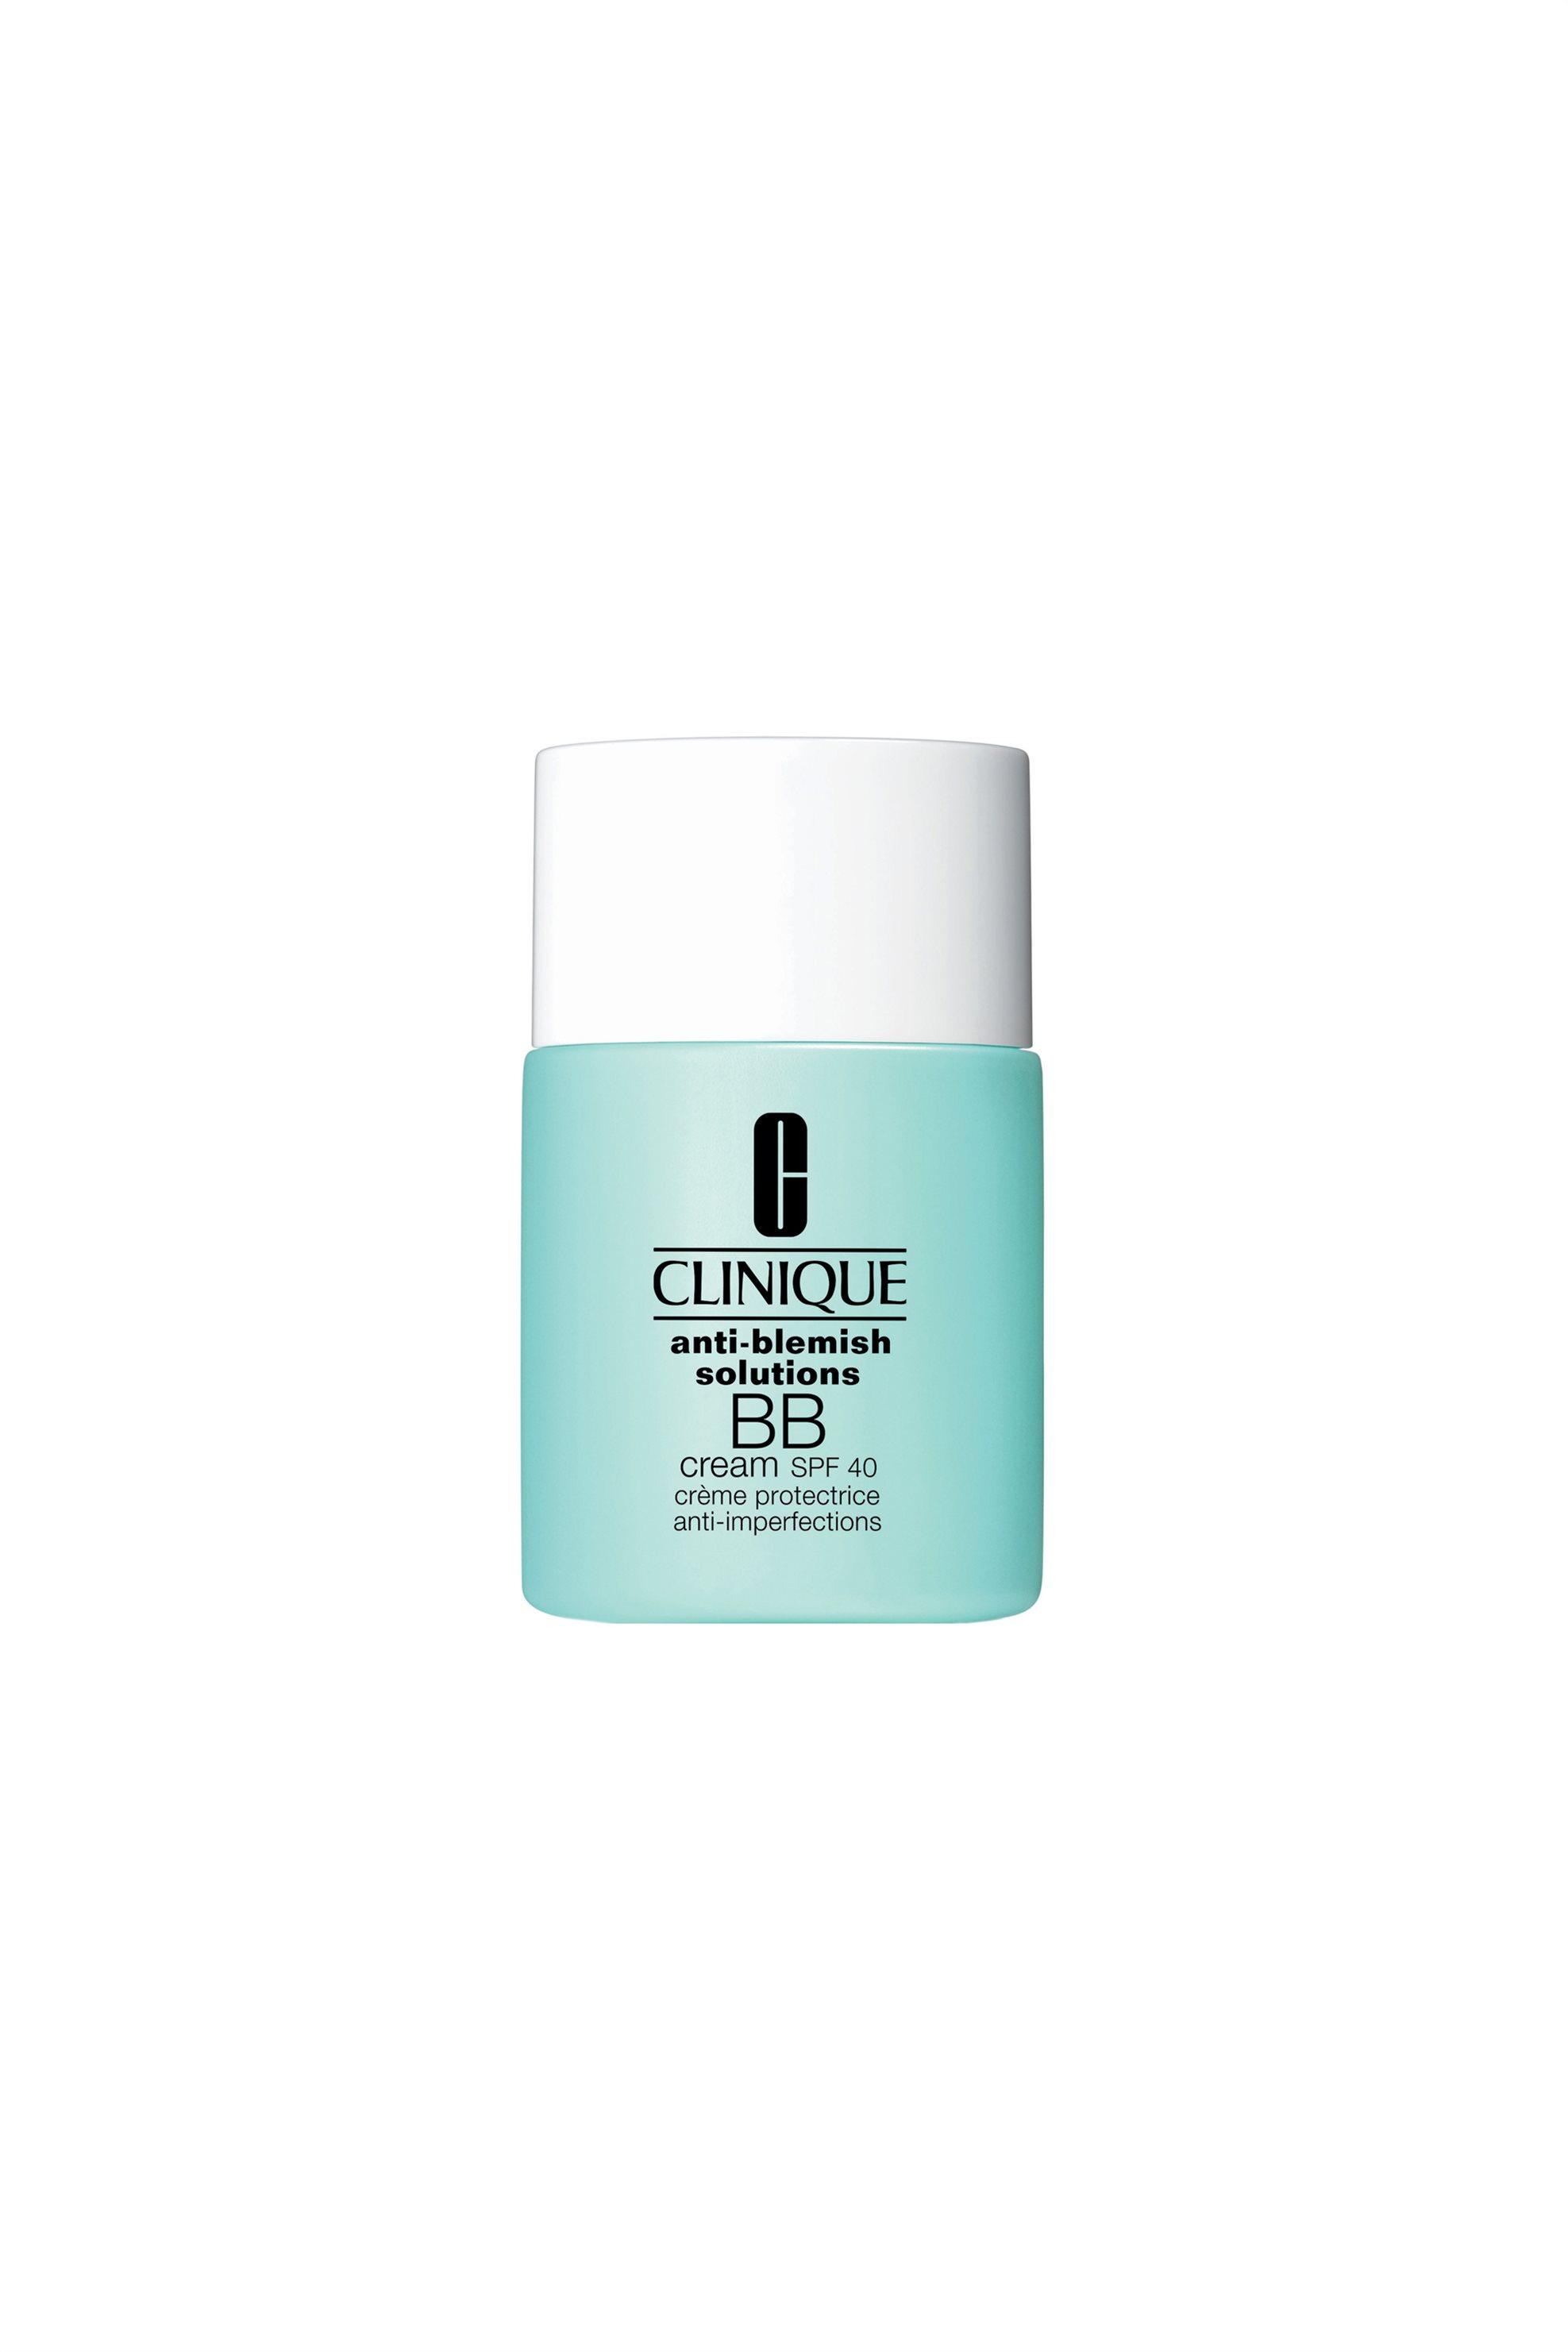 Clinique Acne Solutions BB Cream Broad Spectrum Medium Deep 30 ml - Z54E040000 ομορφια   καλλυντικα επιλεκτικησ   περιποίηση προσώπου   κρέμες ημέρας   bb crea